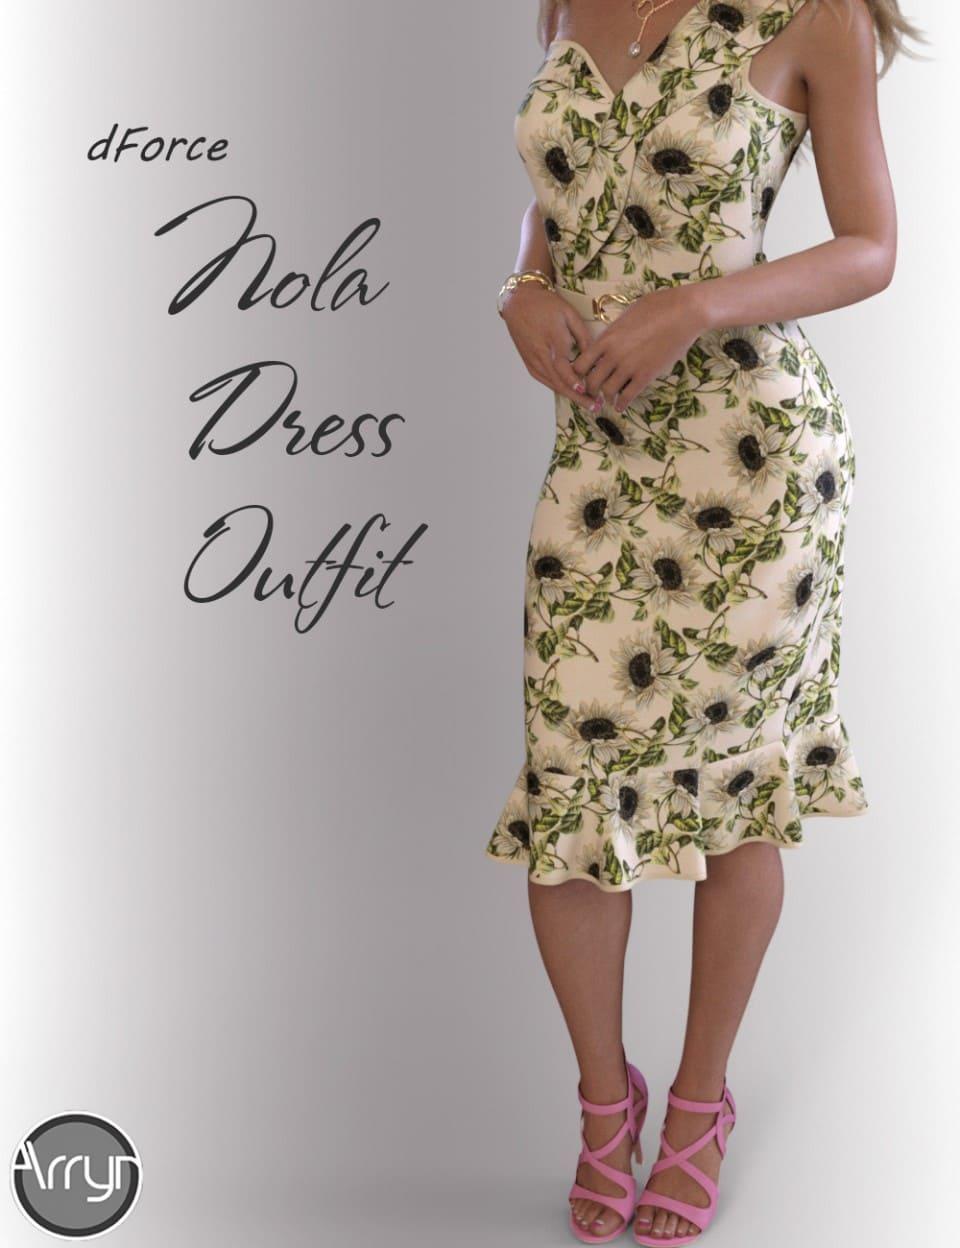 dForce Nola Cocktail Dress outfit for Genesis 8 Female(s)_DAZ3D下载站